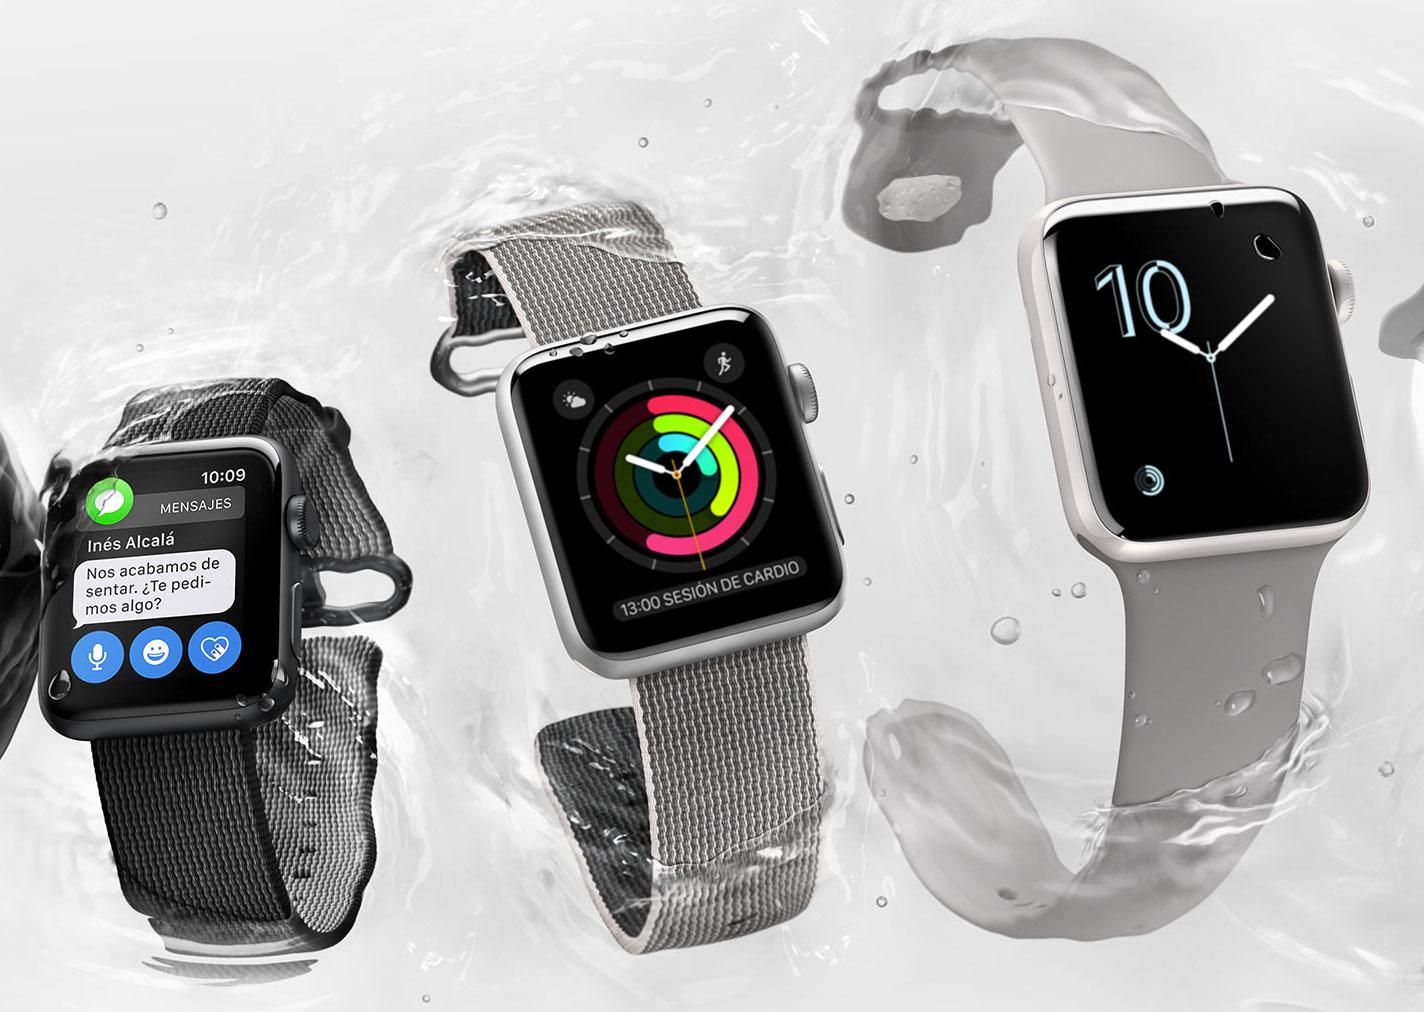 Nuevo Apple Watch 2